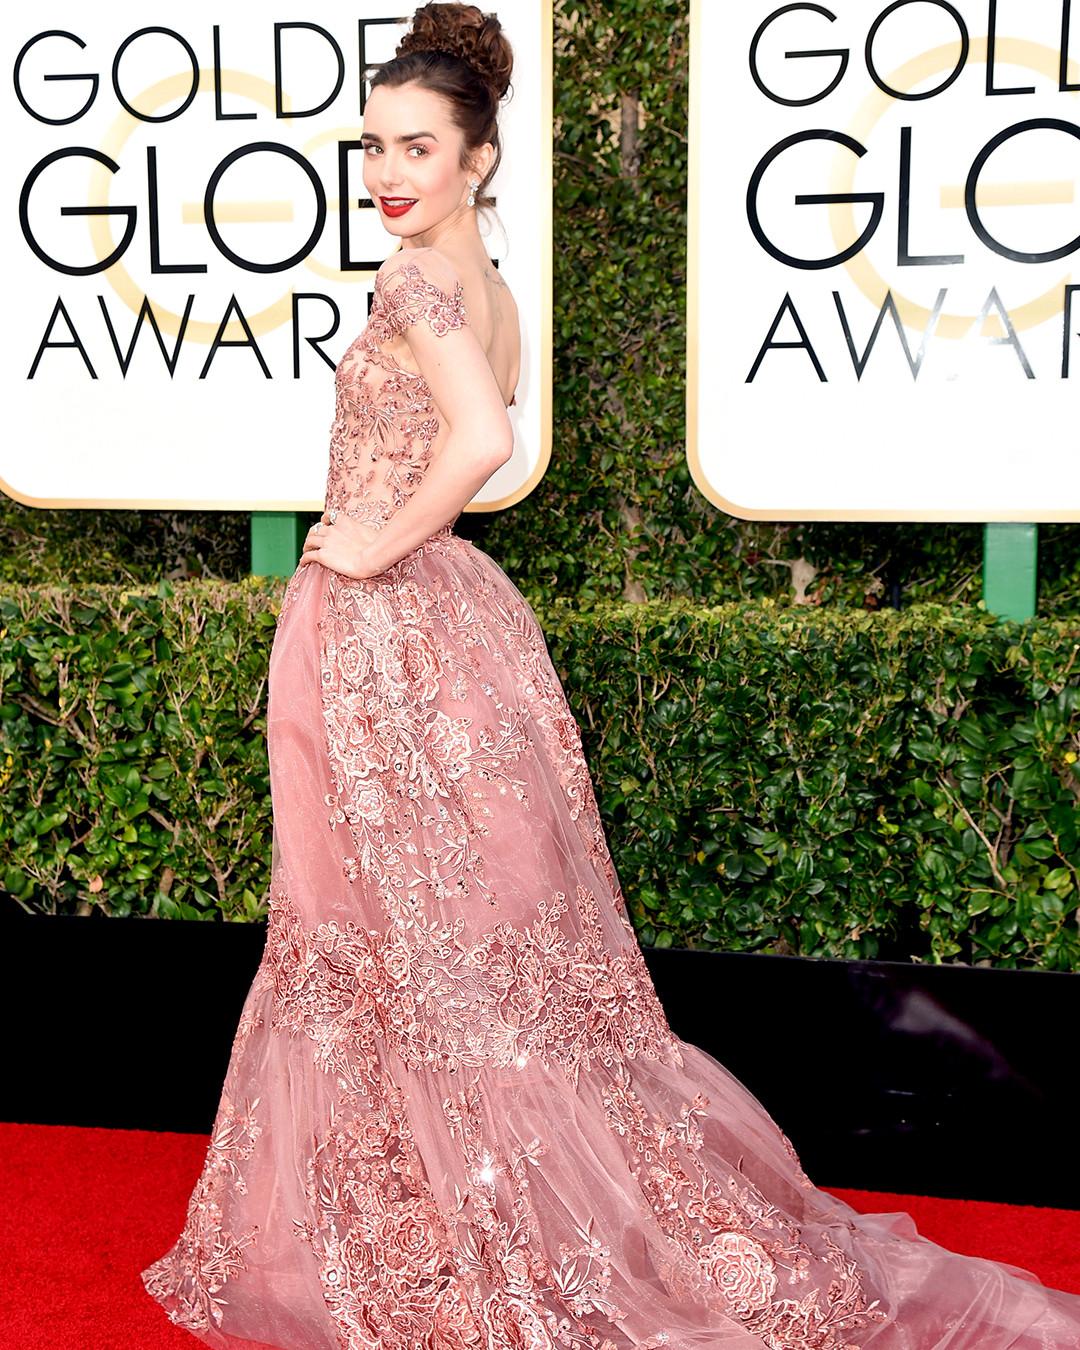 Instagram, Lily Collins, 2017 Golden Globes